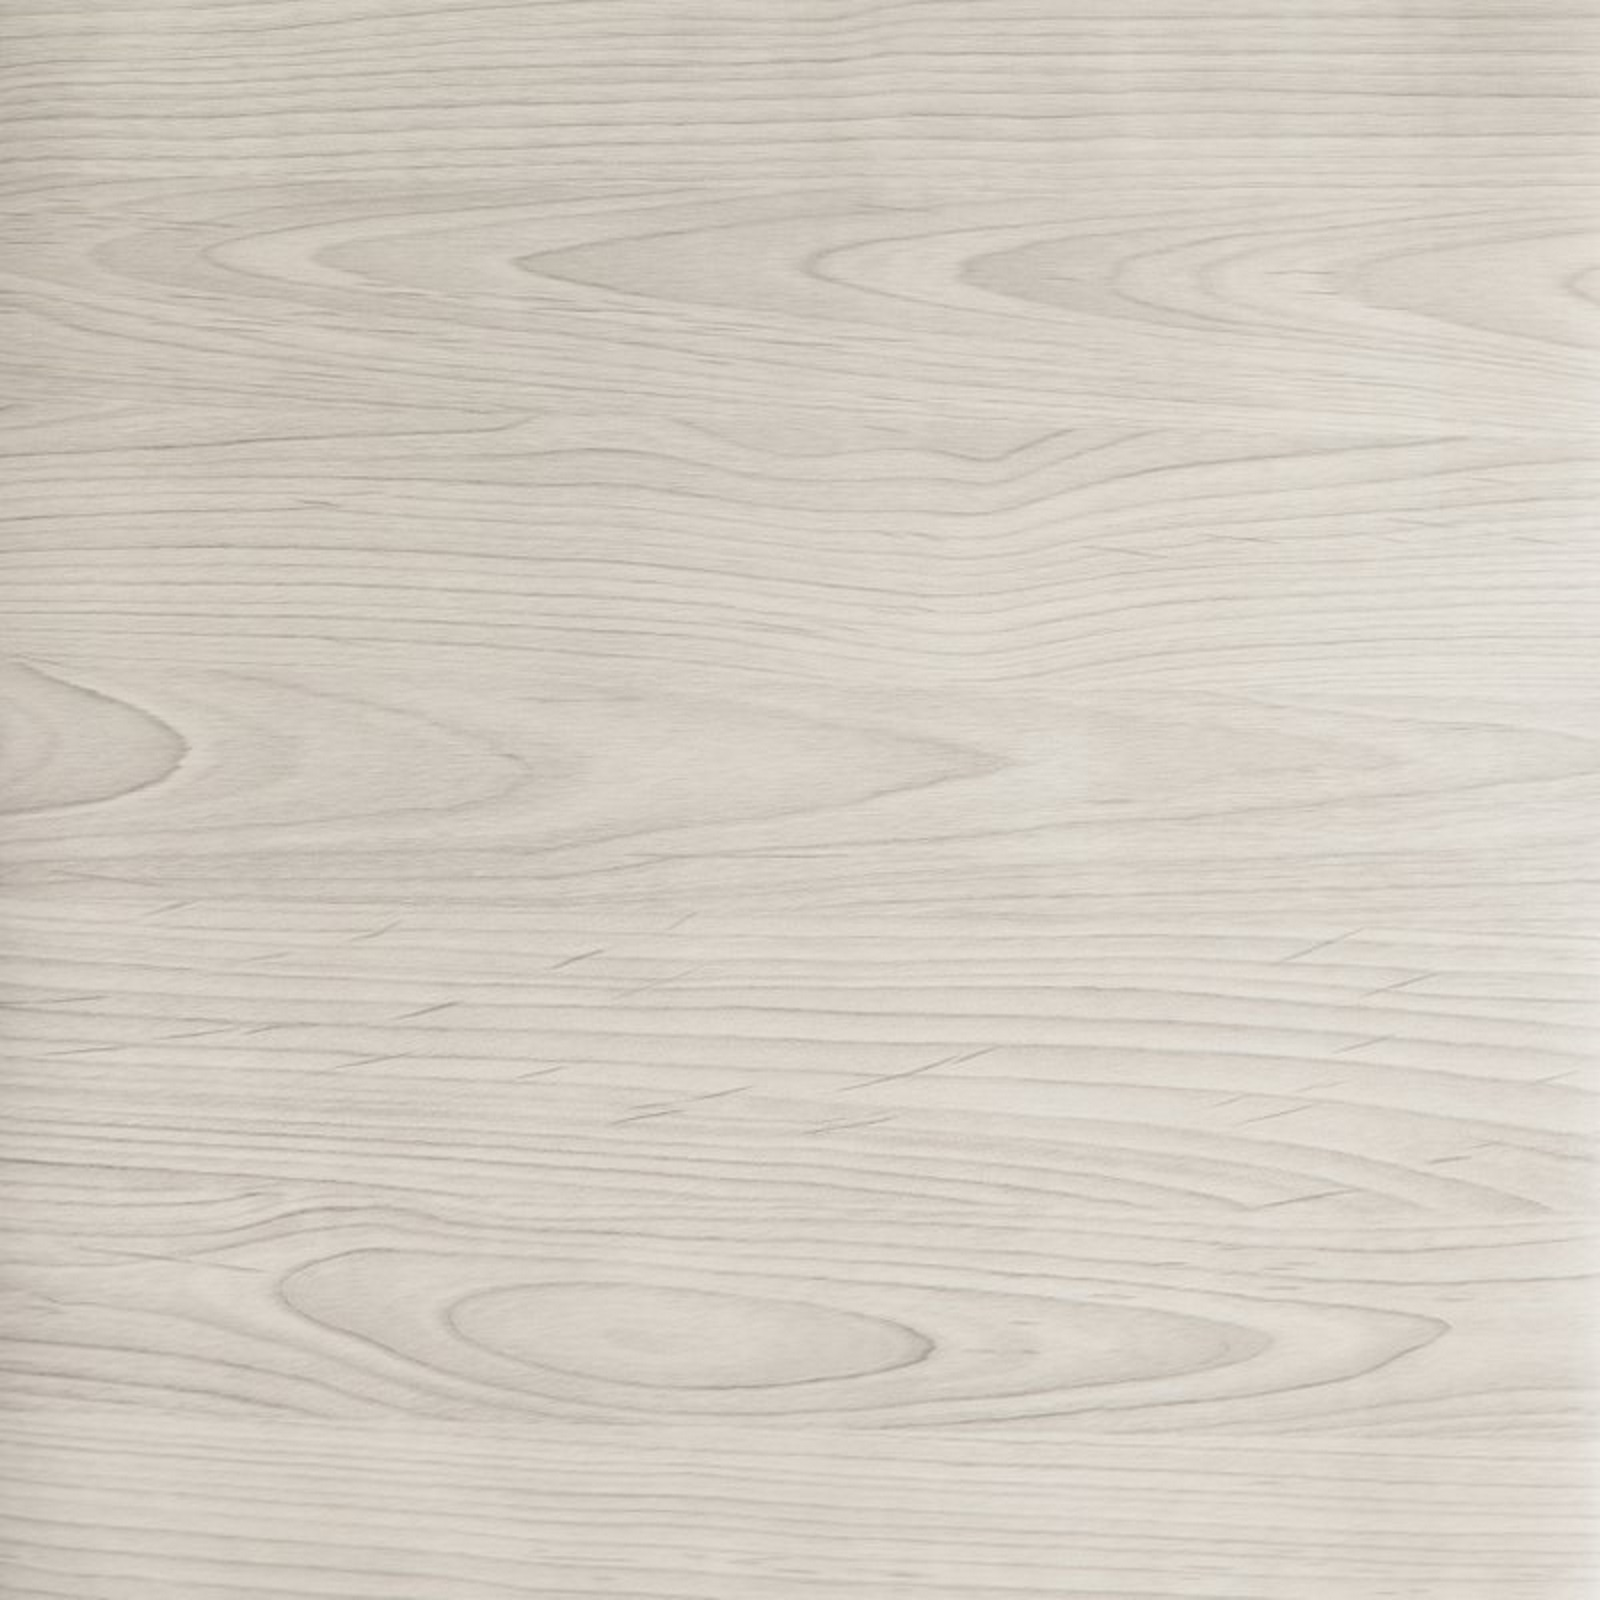 Klebefolie Holz Eiche Muster Hell Dekorfolie Mobel Selbstklebende